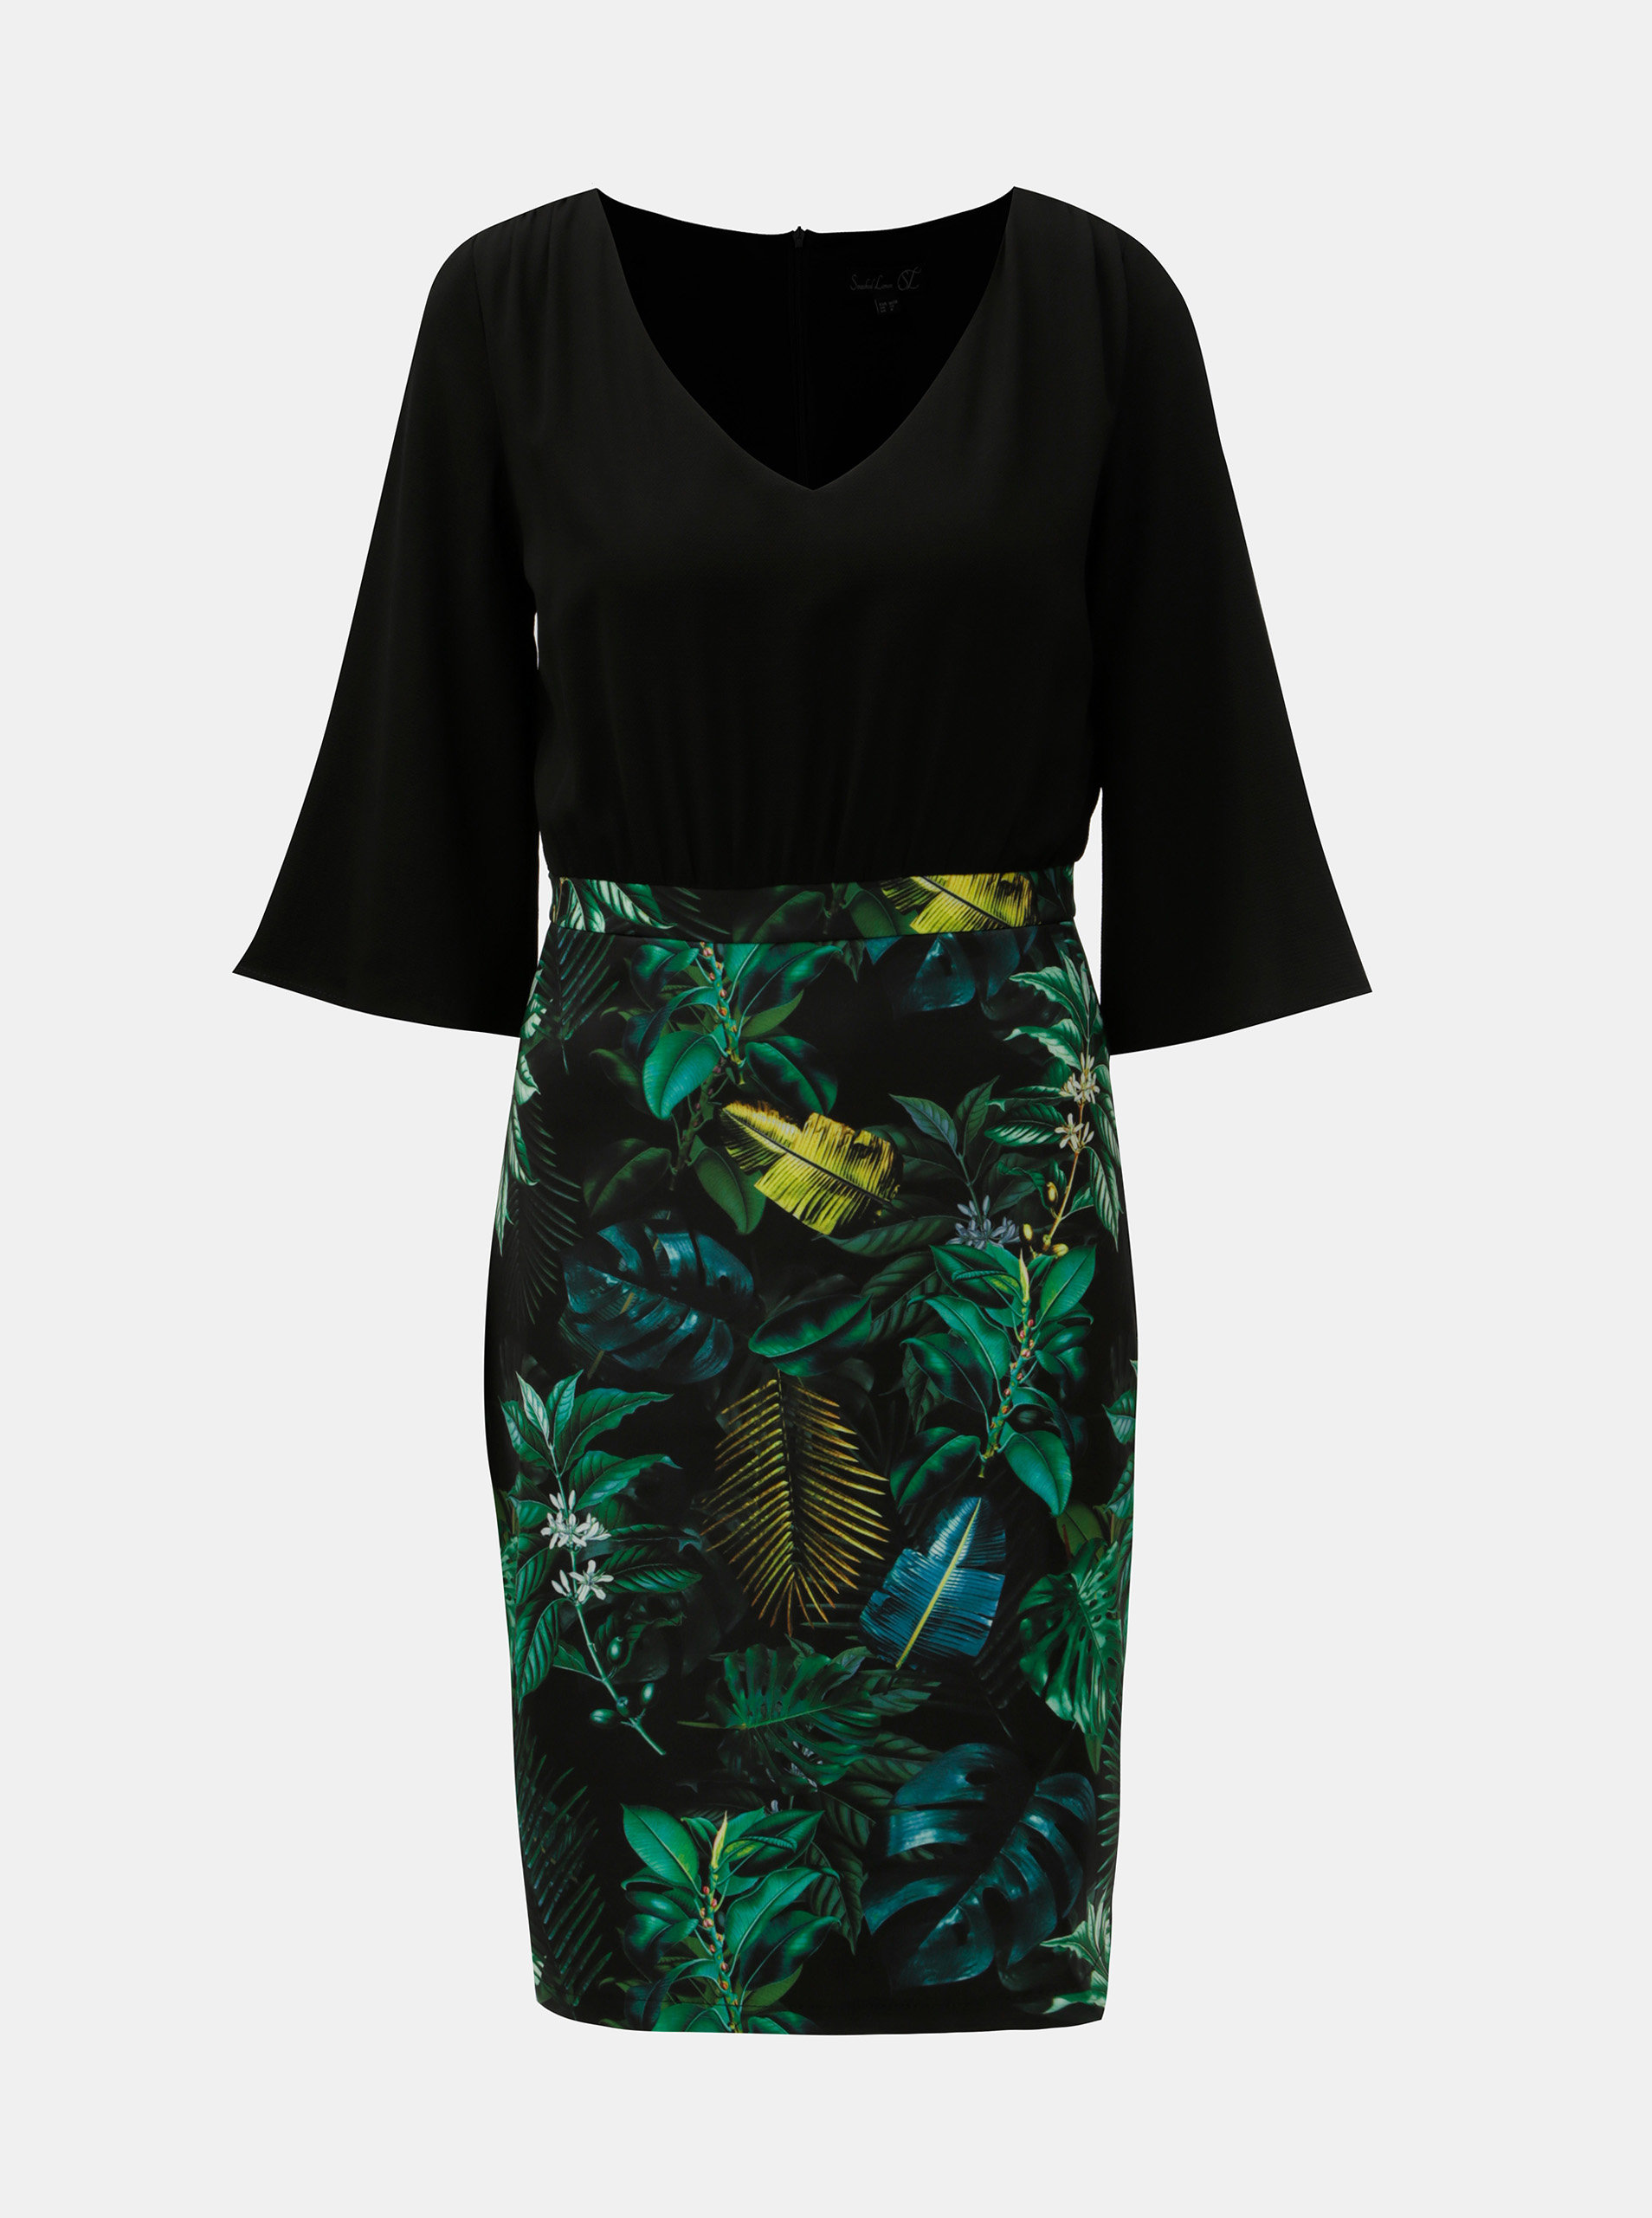 Zeleno–čierne puzdrové šaty s motívom listov Smashed Lemon ... a8d3304a69b